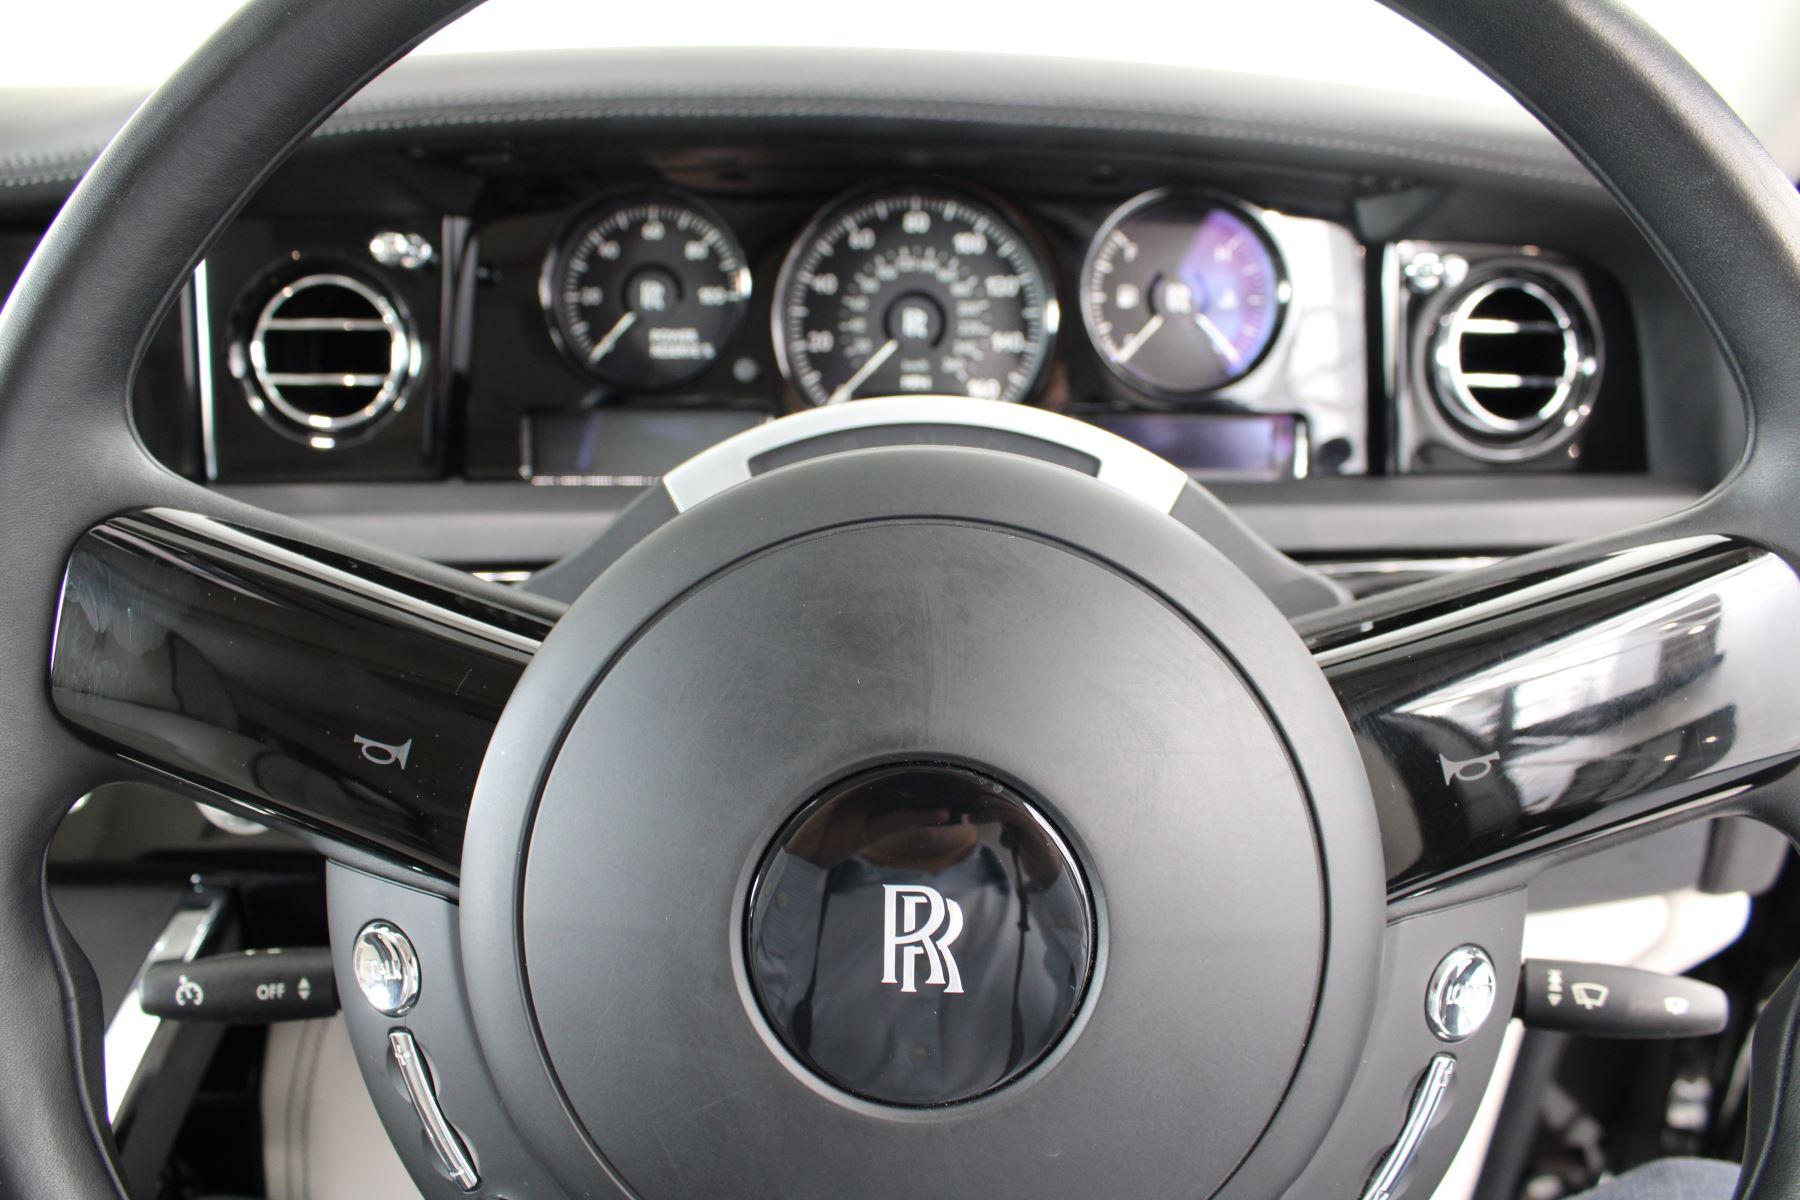 Rolls-Royce Phantom II 4dr Auto image 17